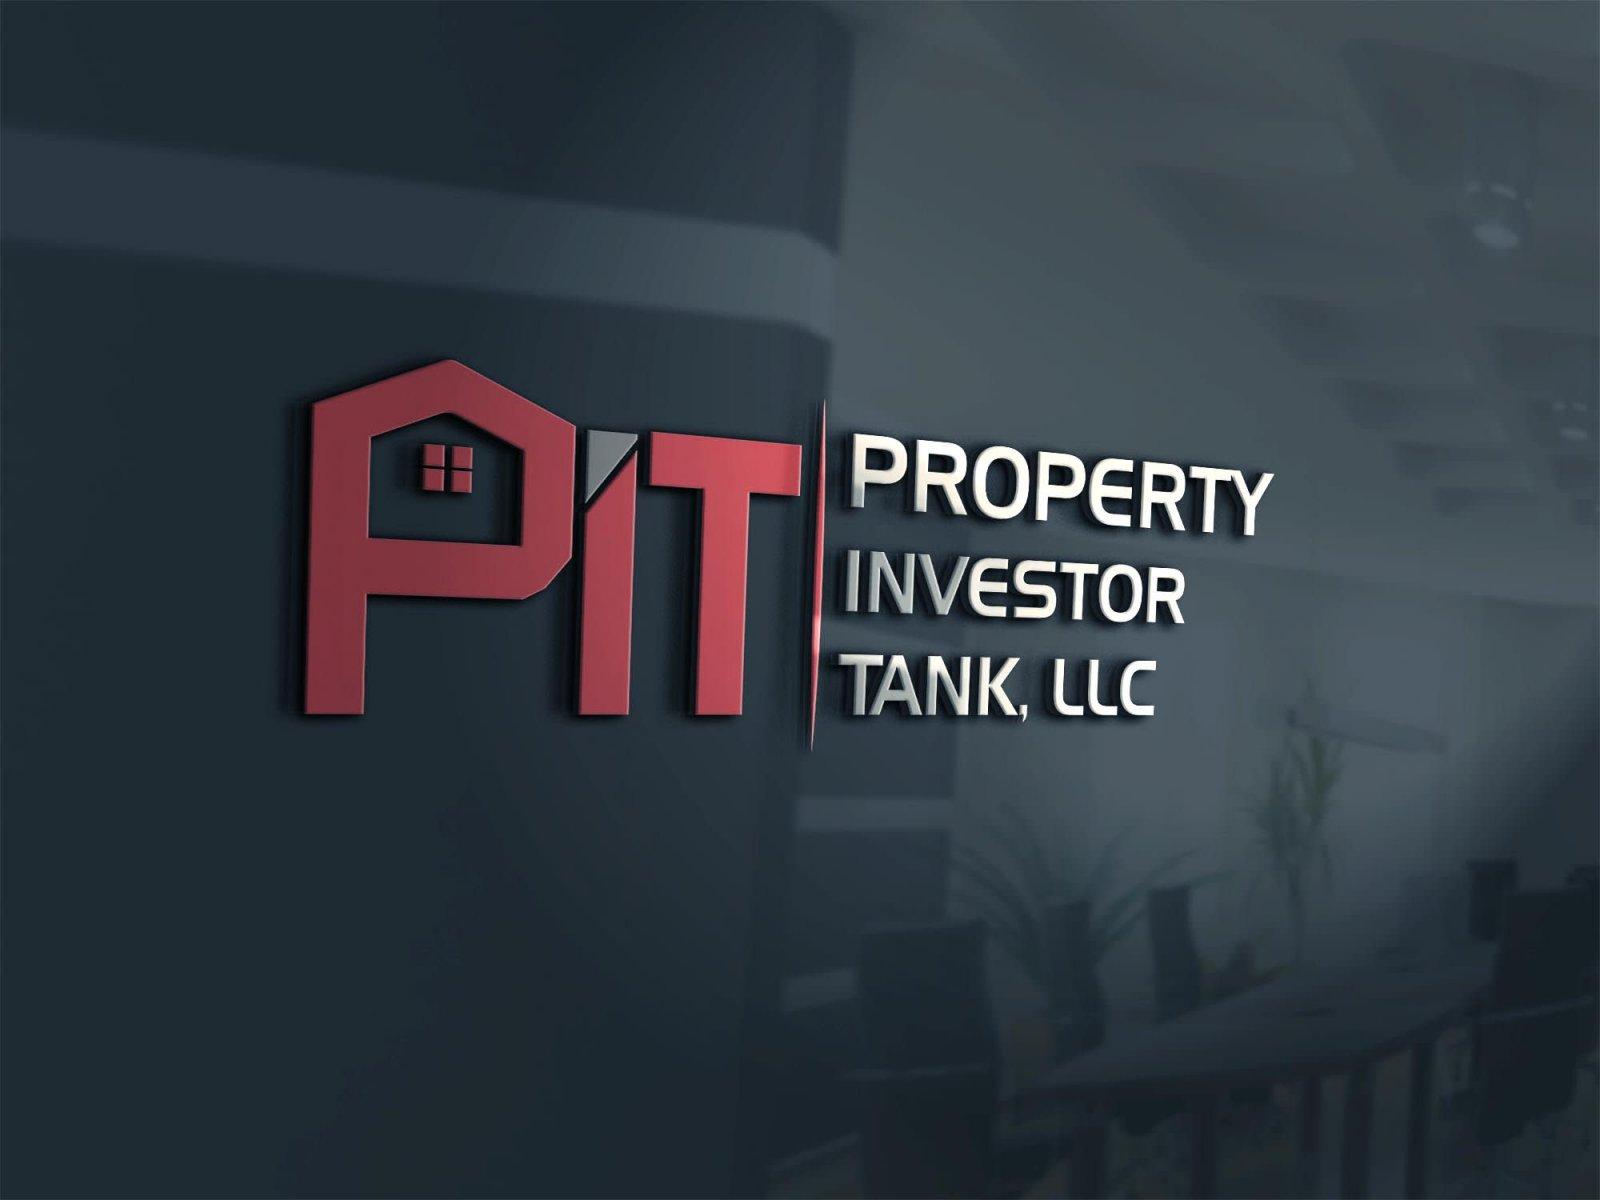 Property Investor Tank, LLC logo